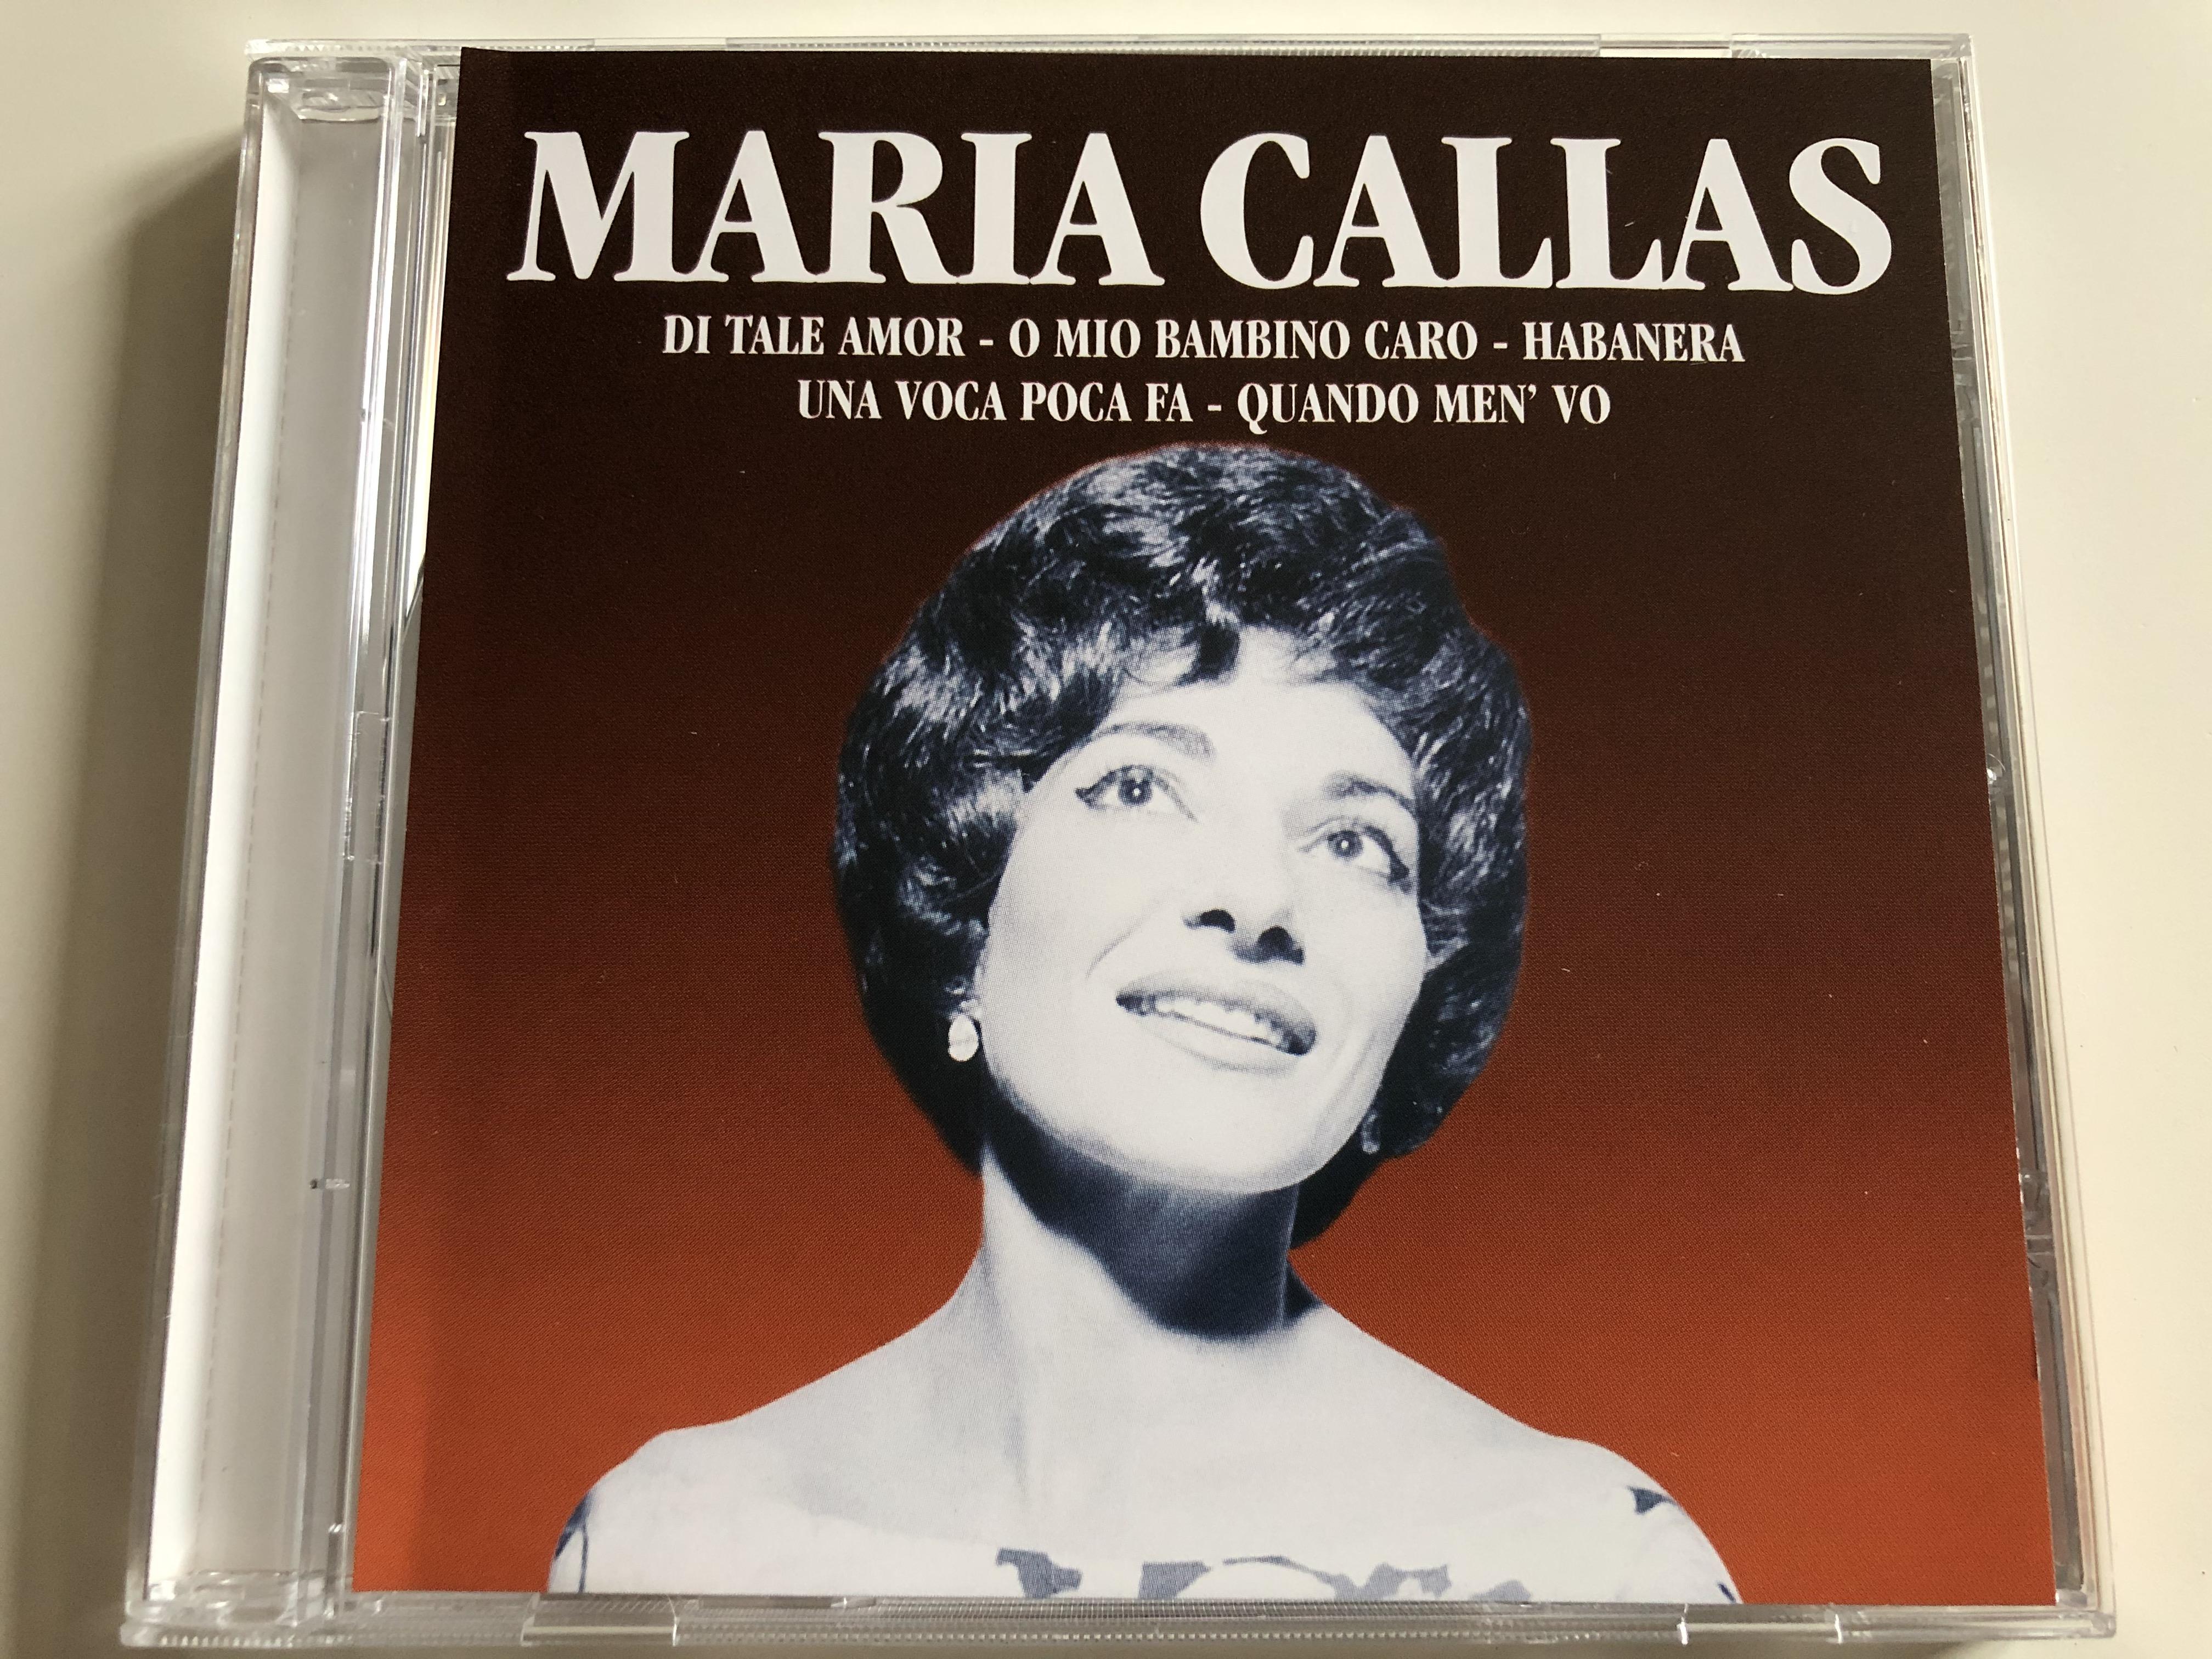 maria-callas-di-tale-amor-o-mio-bambino-caro-habanera-una-voca-poca-fa-quando-men-vo-weton-wesgram-audio-cd-2001-cd97135-1-.jpg